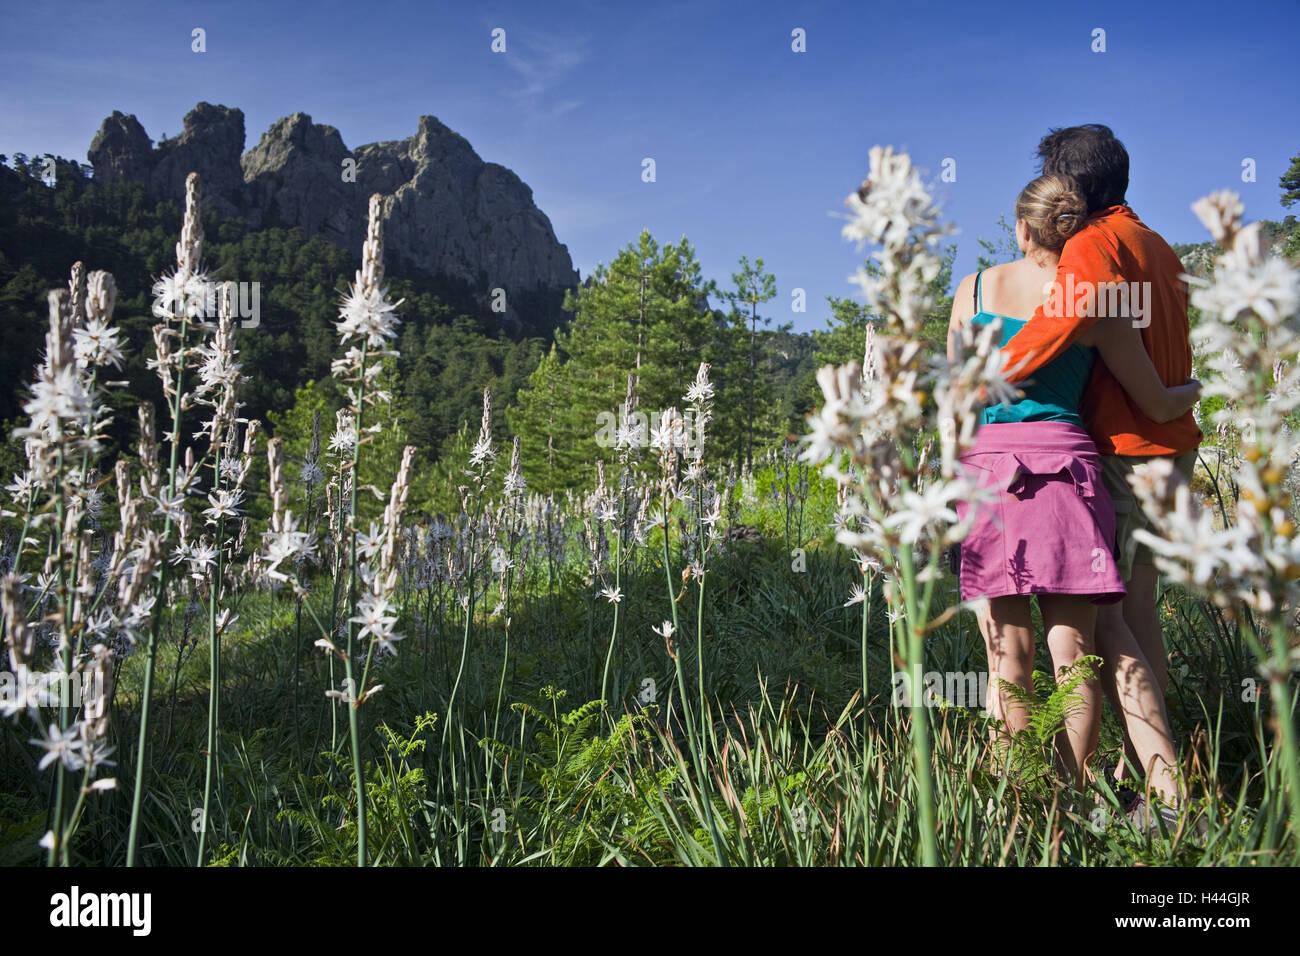 Francia, Córcega, Col de Bavella, pareja, caminar, vista posterior, Imagen De Stock